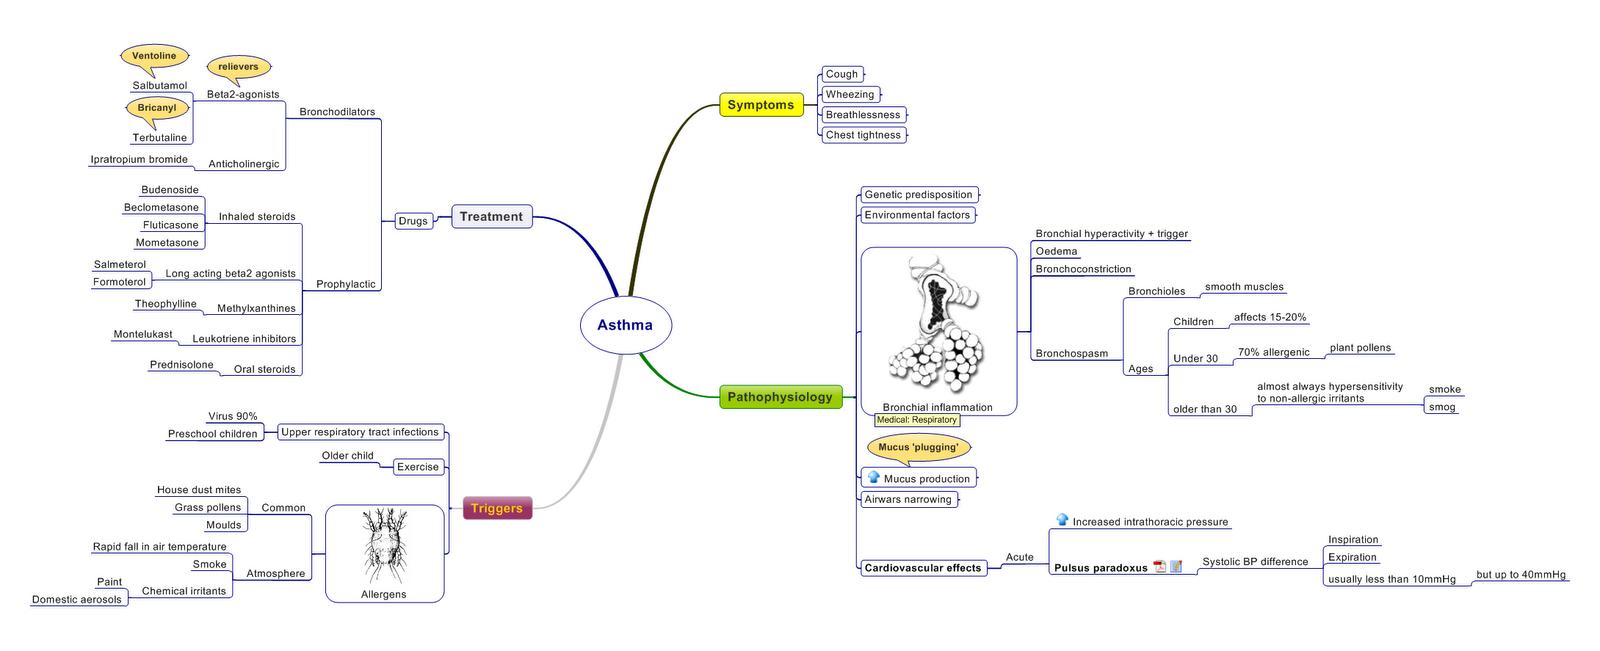 Images Of Nursing Concept Map Copd SC - Nursing concept map generator